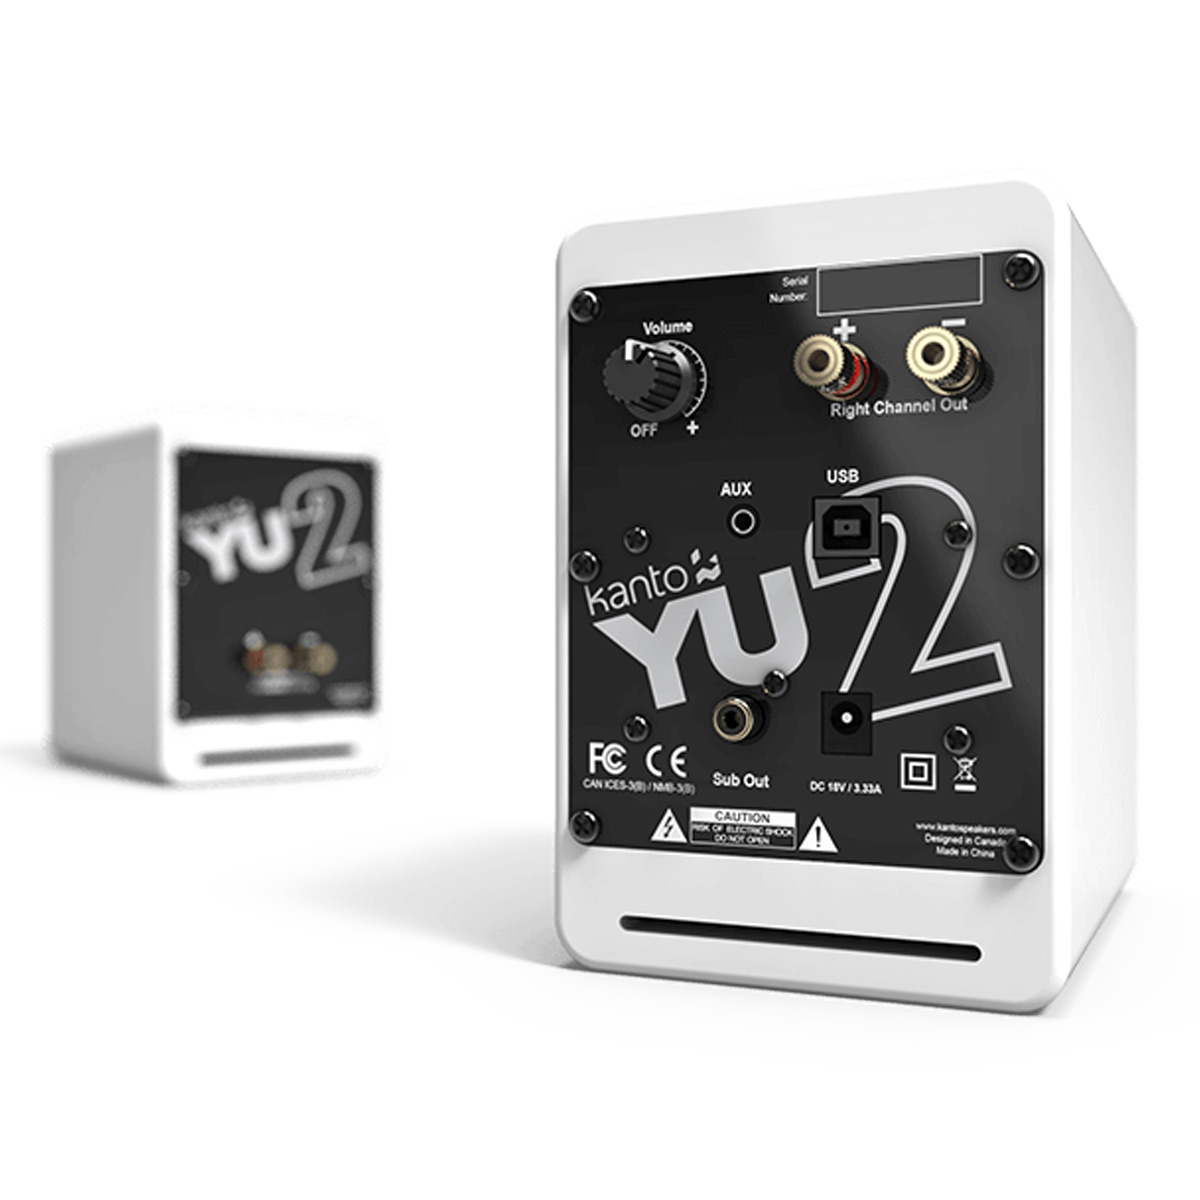 thumbnail 13 - Kanto YU2 Powered Desktop Speakers - Pair